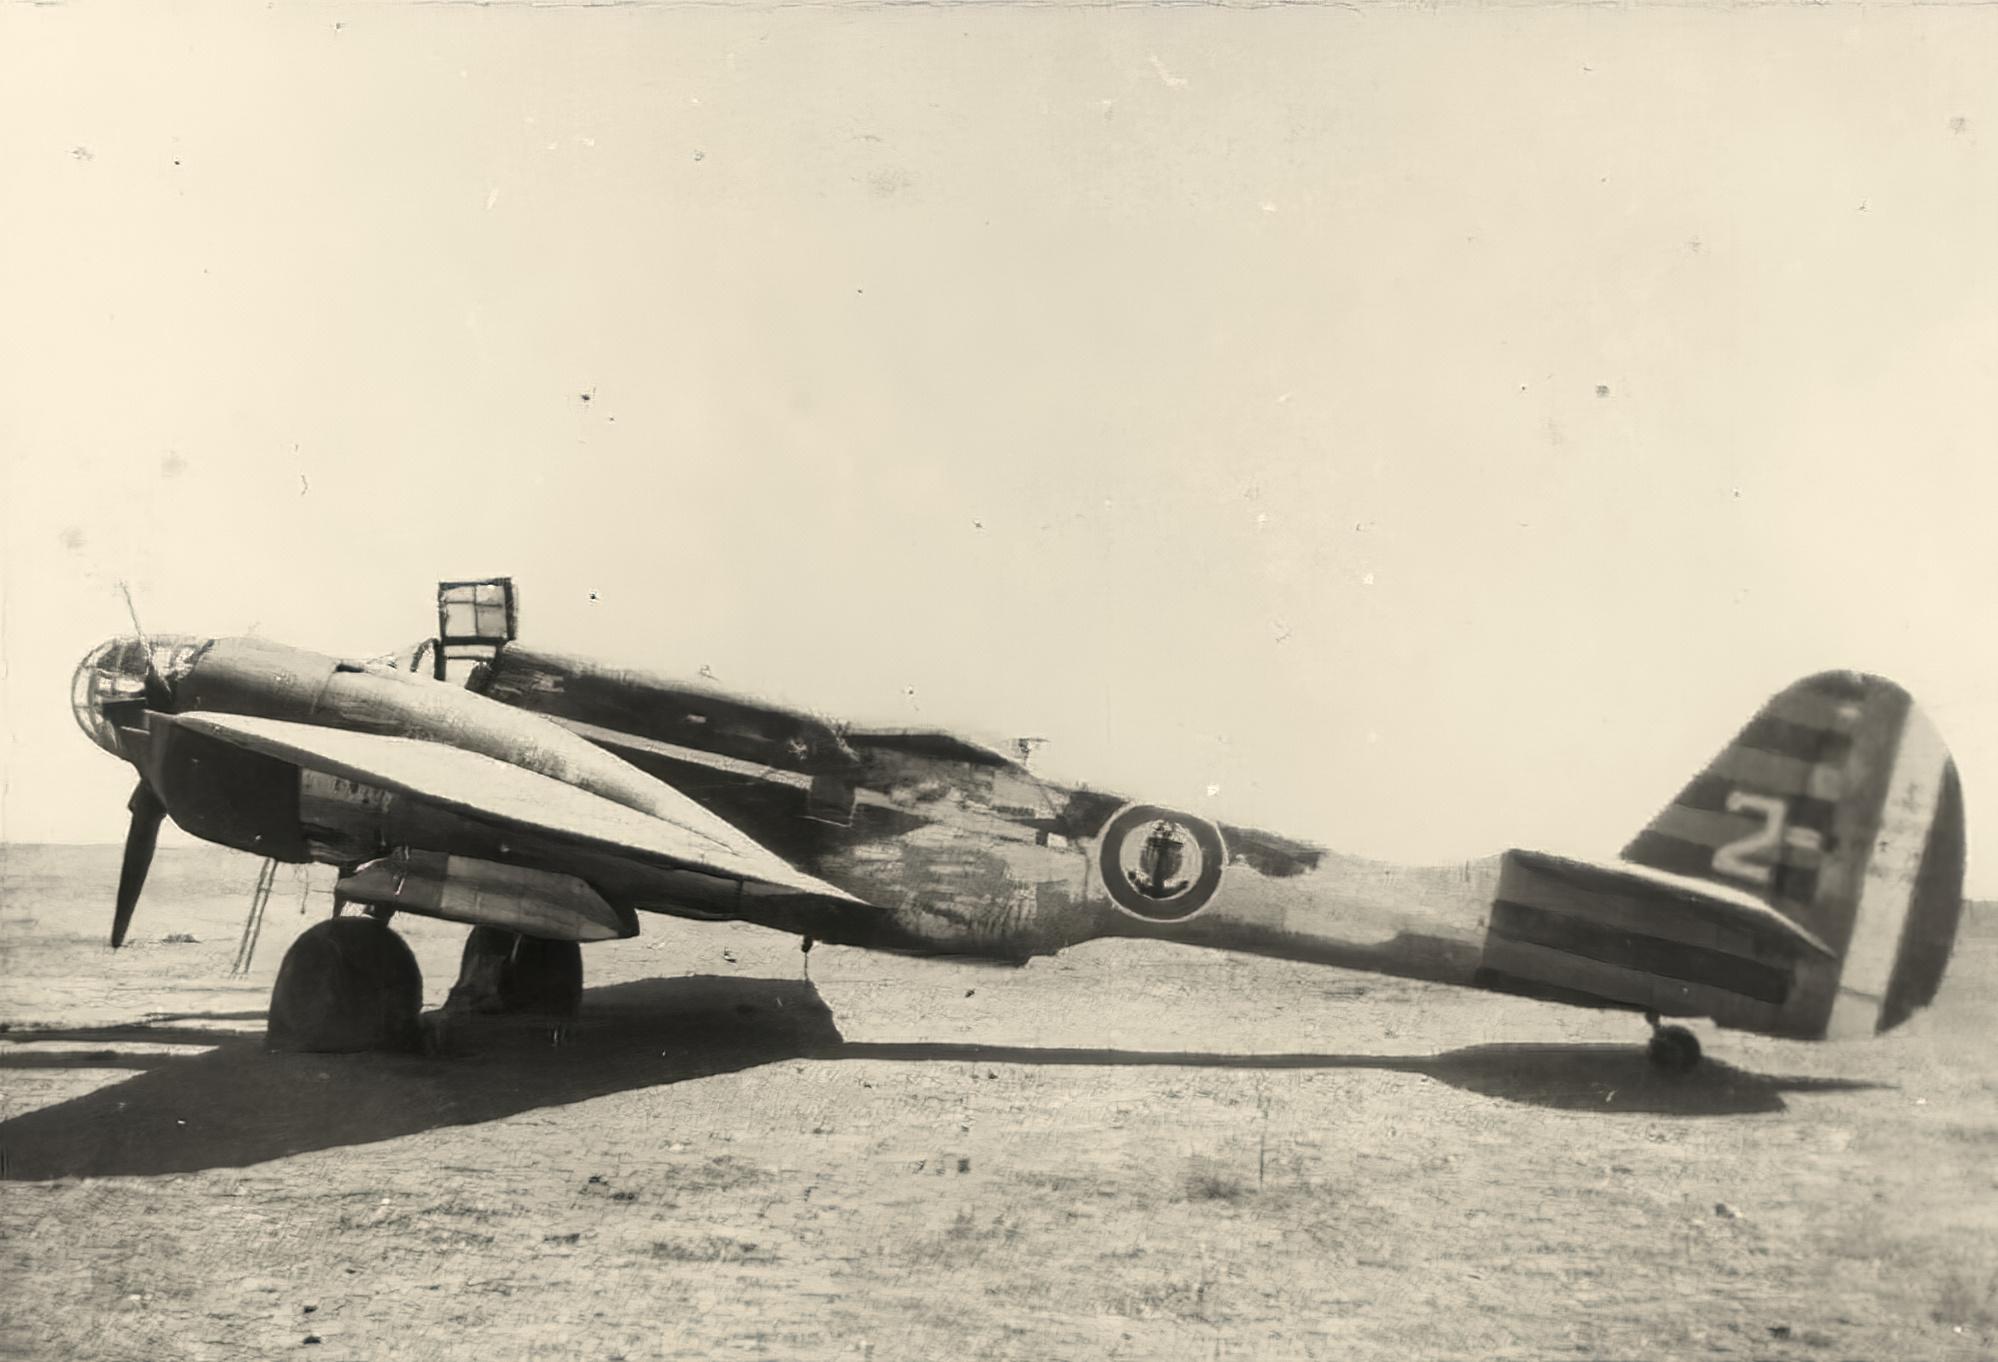 Vichy French Navy Airforce Glen Martin 167 Maryland White 2 in North Africa ebay 01